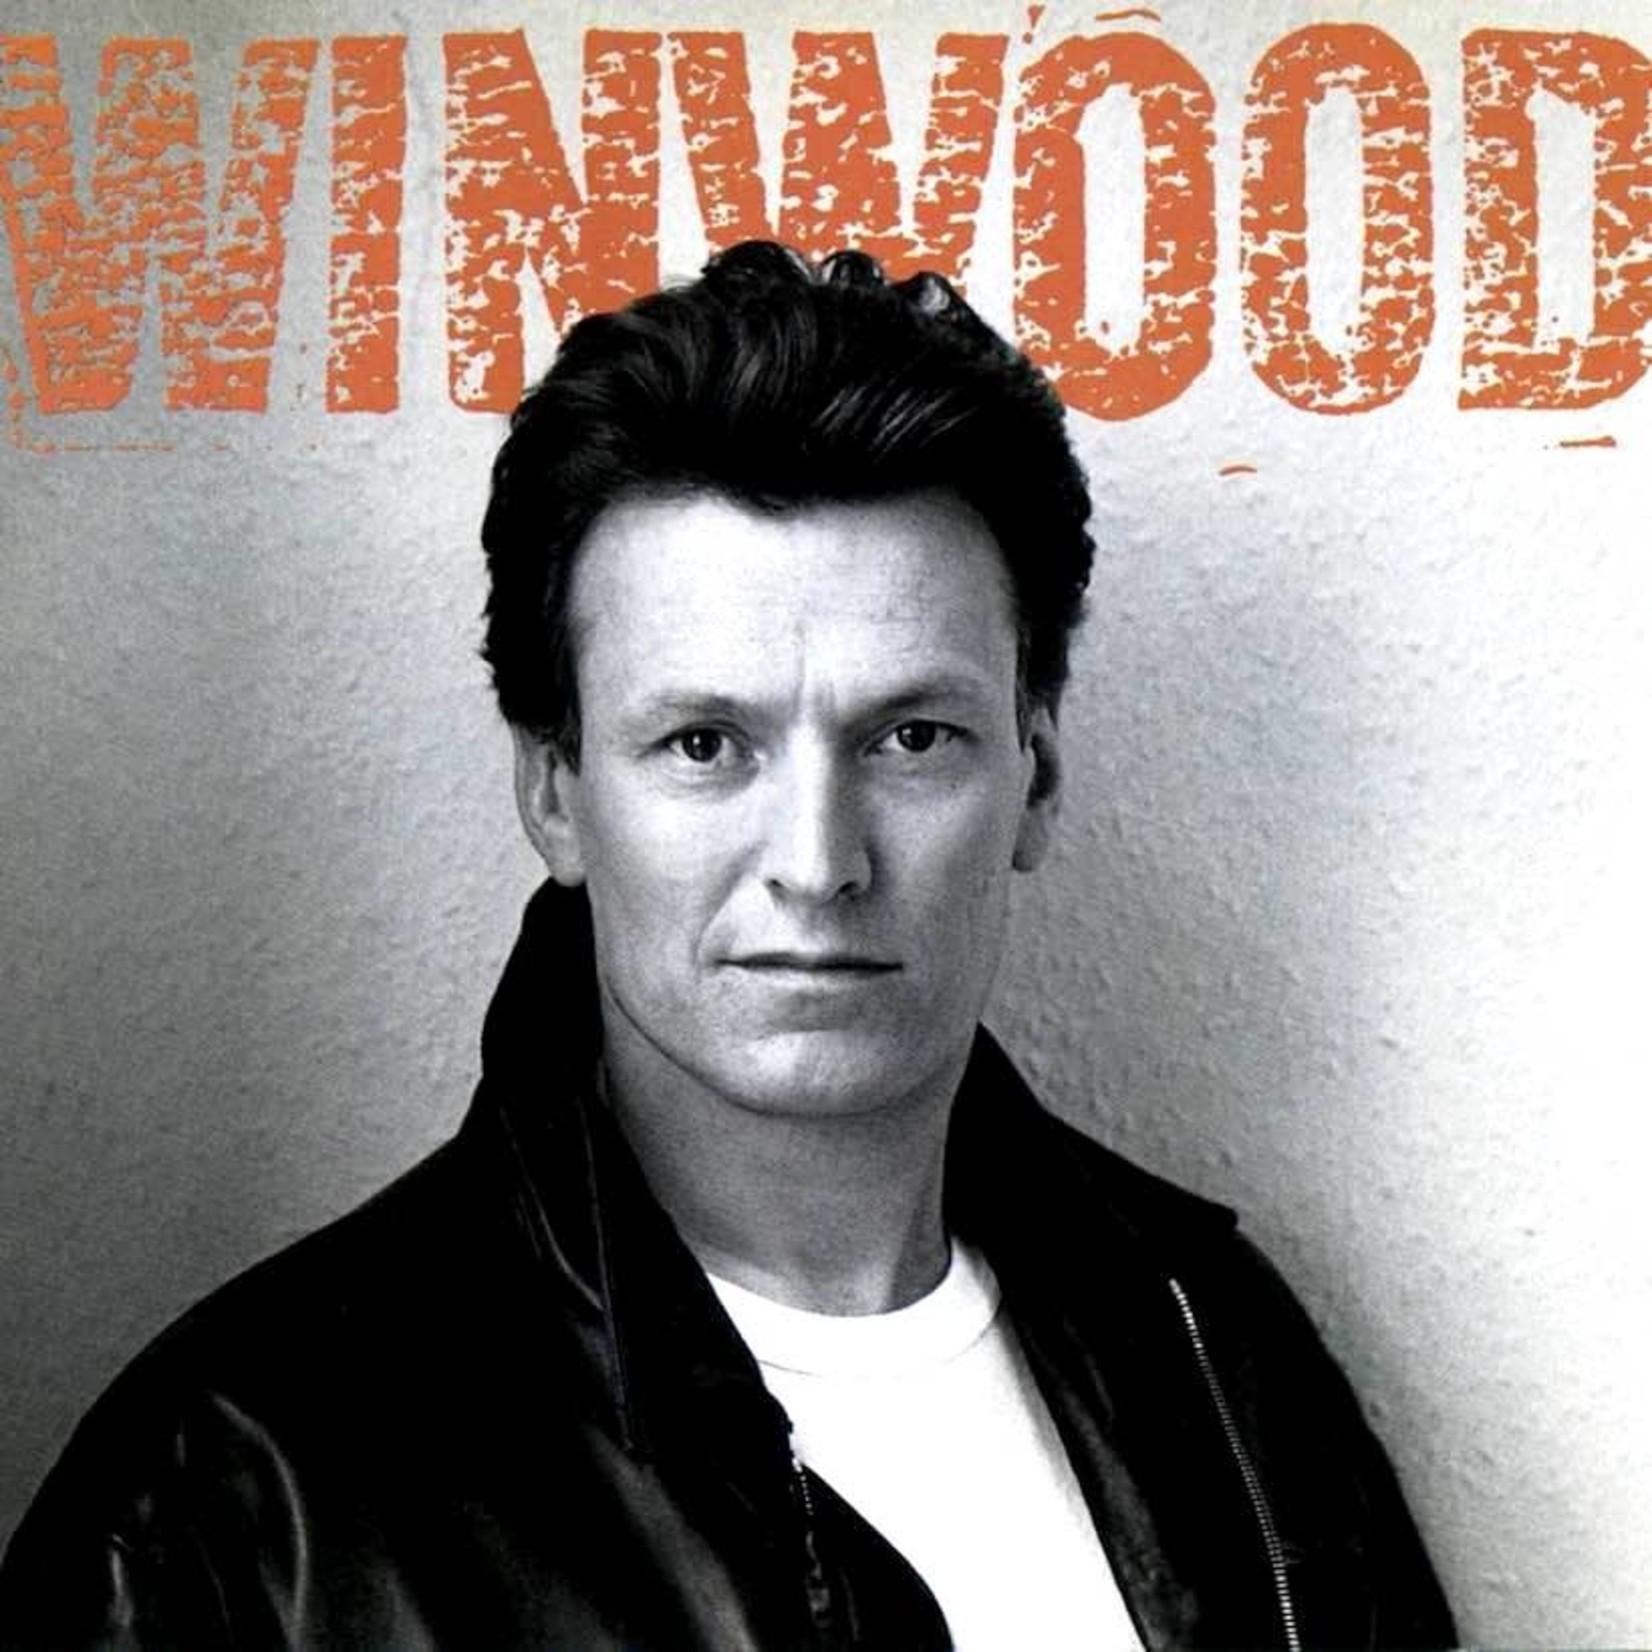 [Vintage] Winwood, Steve: Roll With It